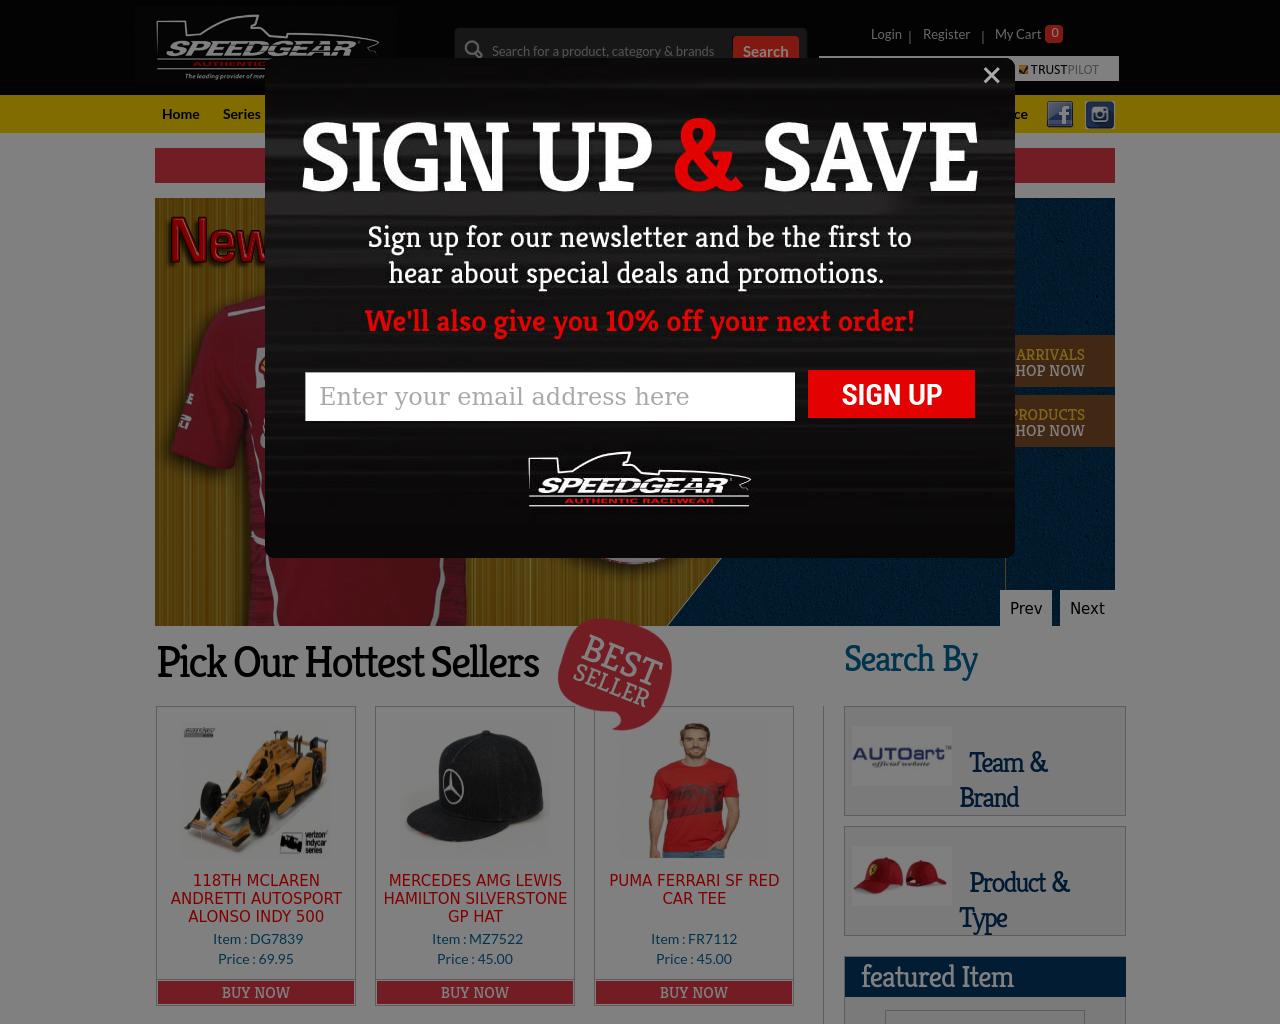 SPEED-GEAR-Advertising-Reviews-Pricing